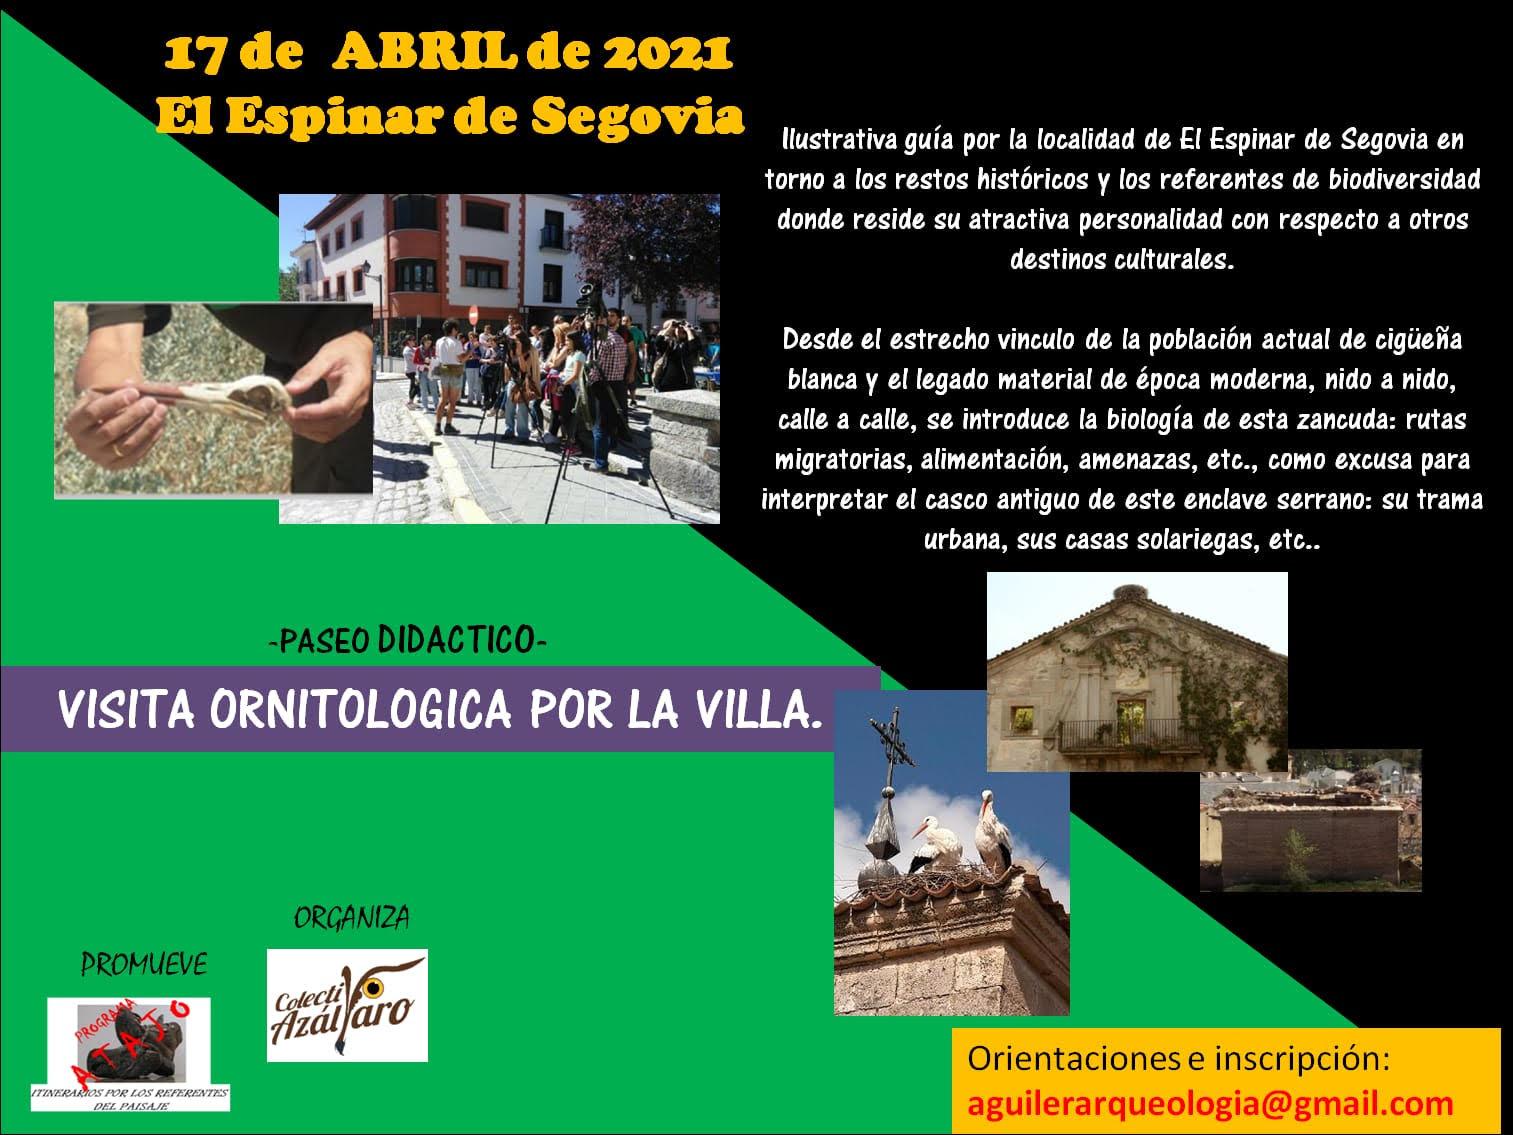 Ornithological visit to El Espinar